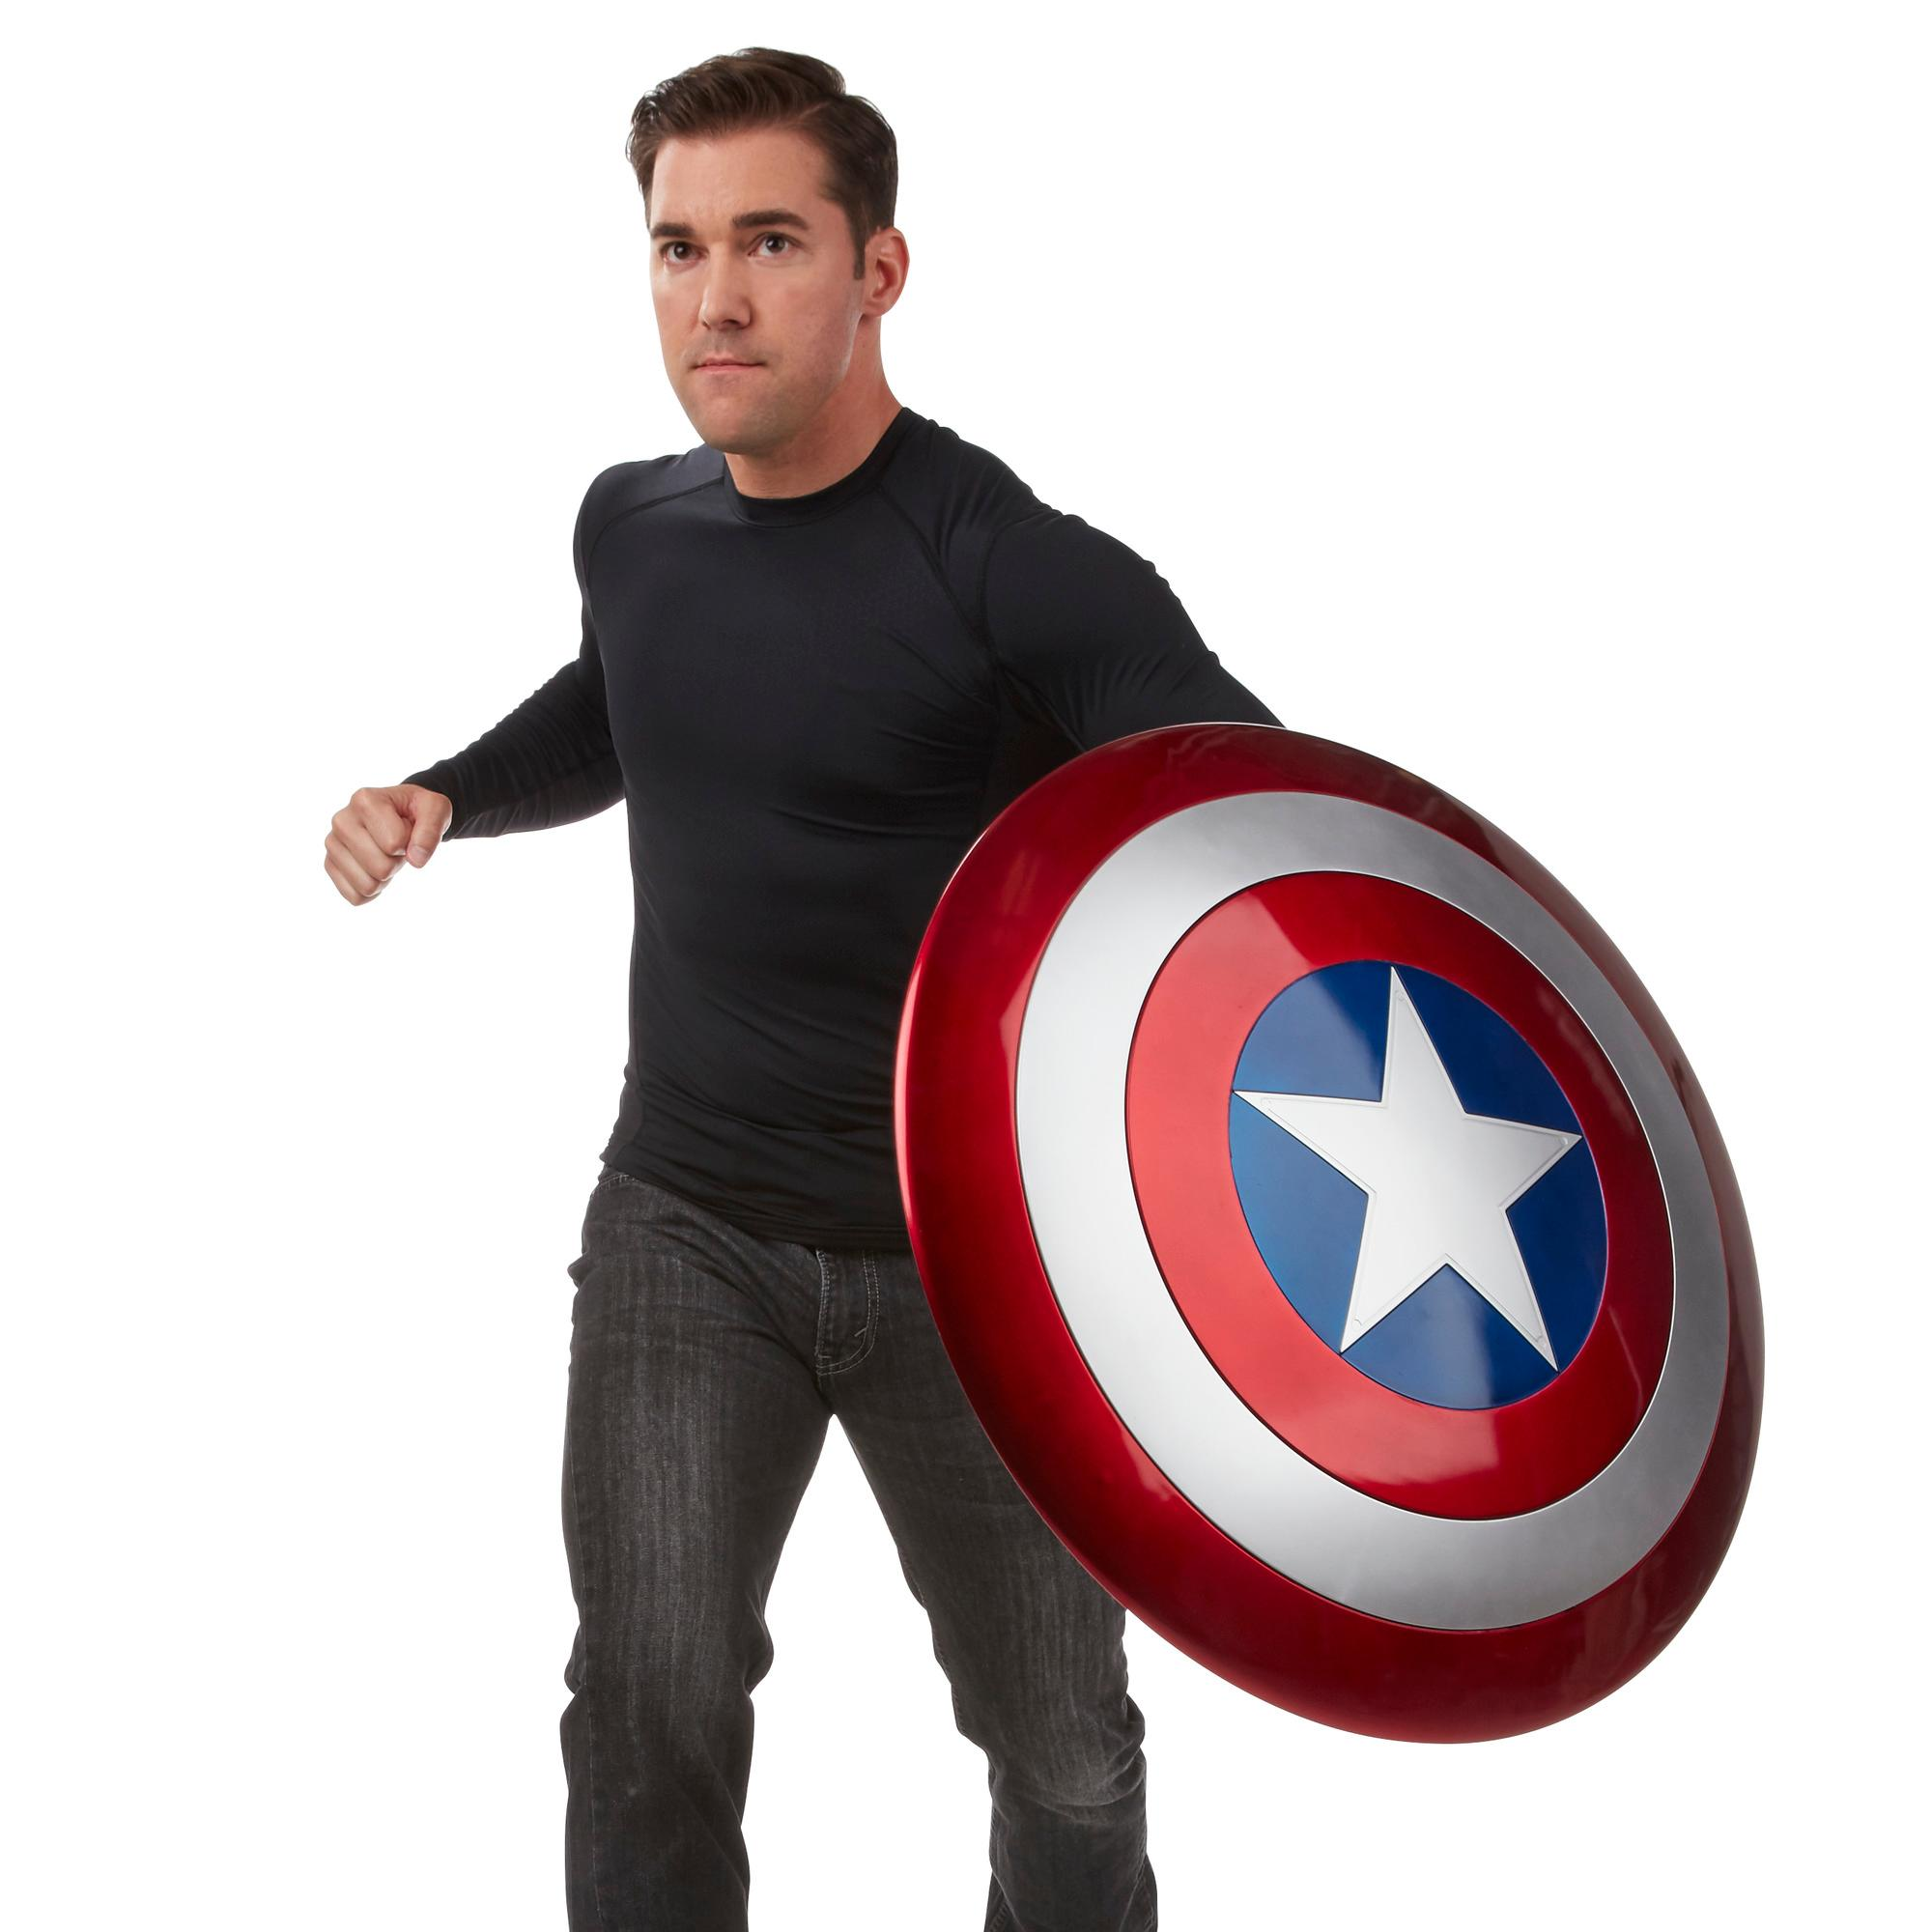 avengers legends gear captain america shield figure. Black Bedroom Furniture Sets. Home Design Ideas